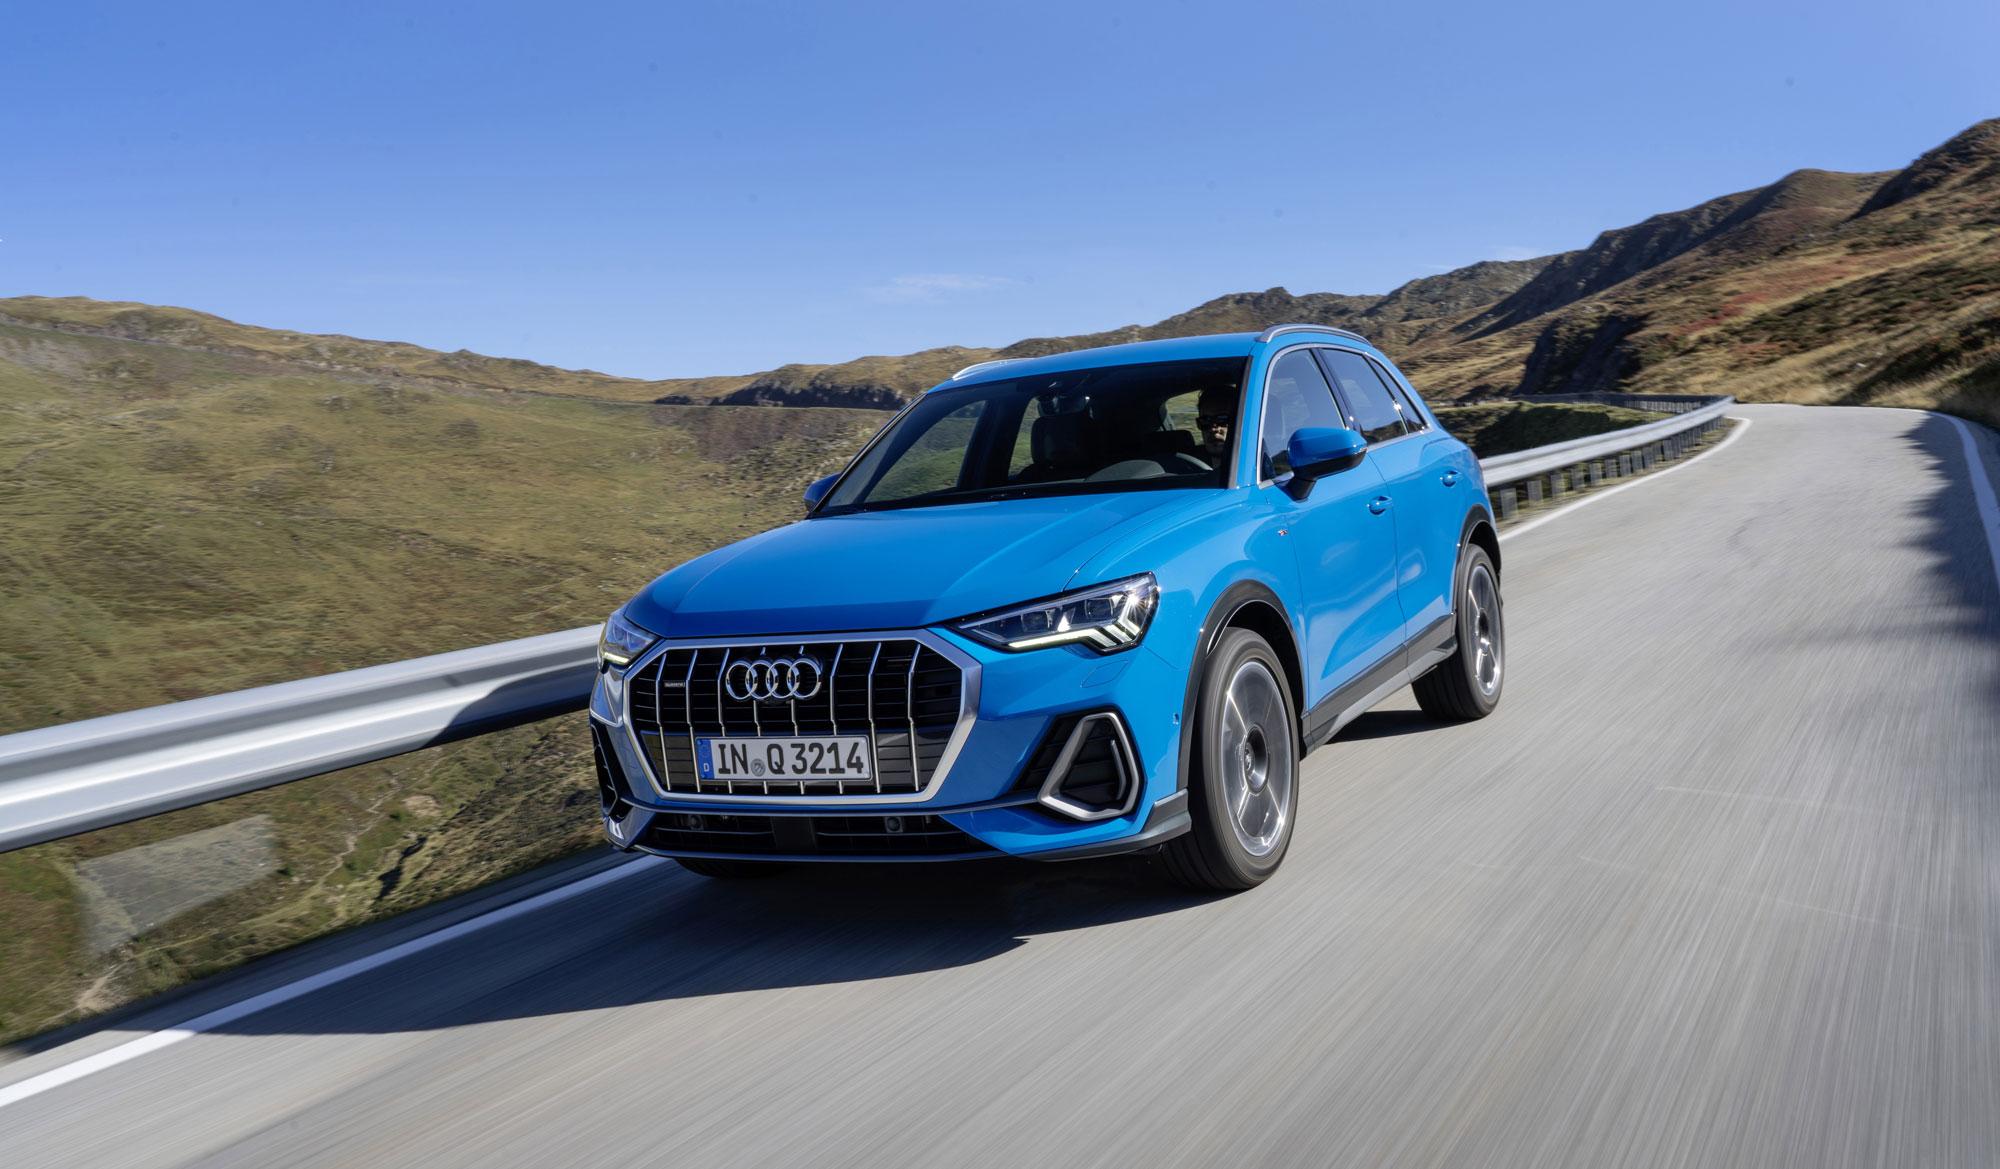 La seductora imagen del nuevo Audi Q3